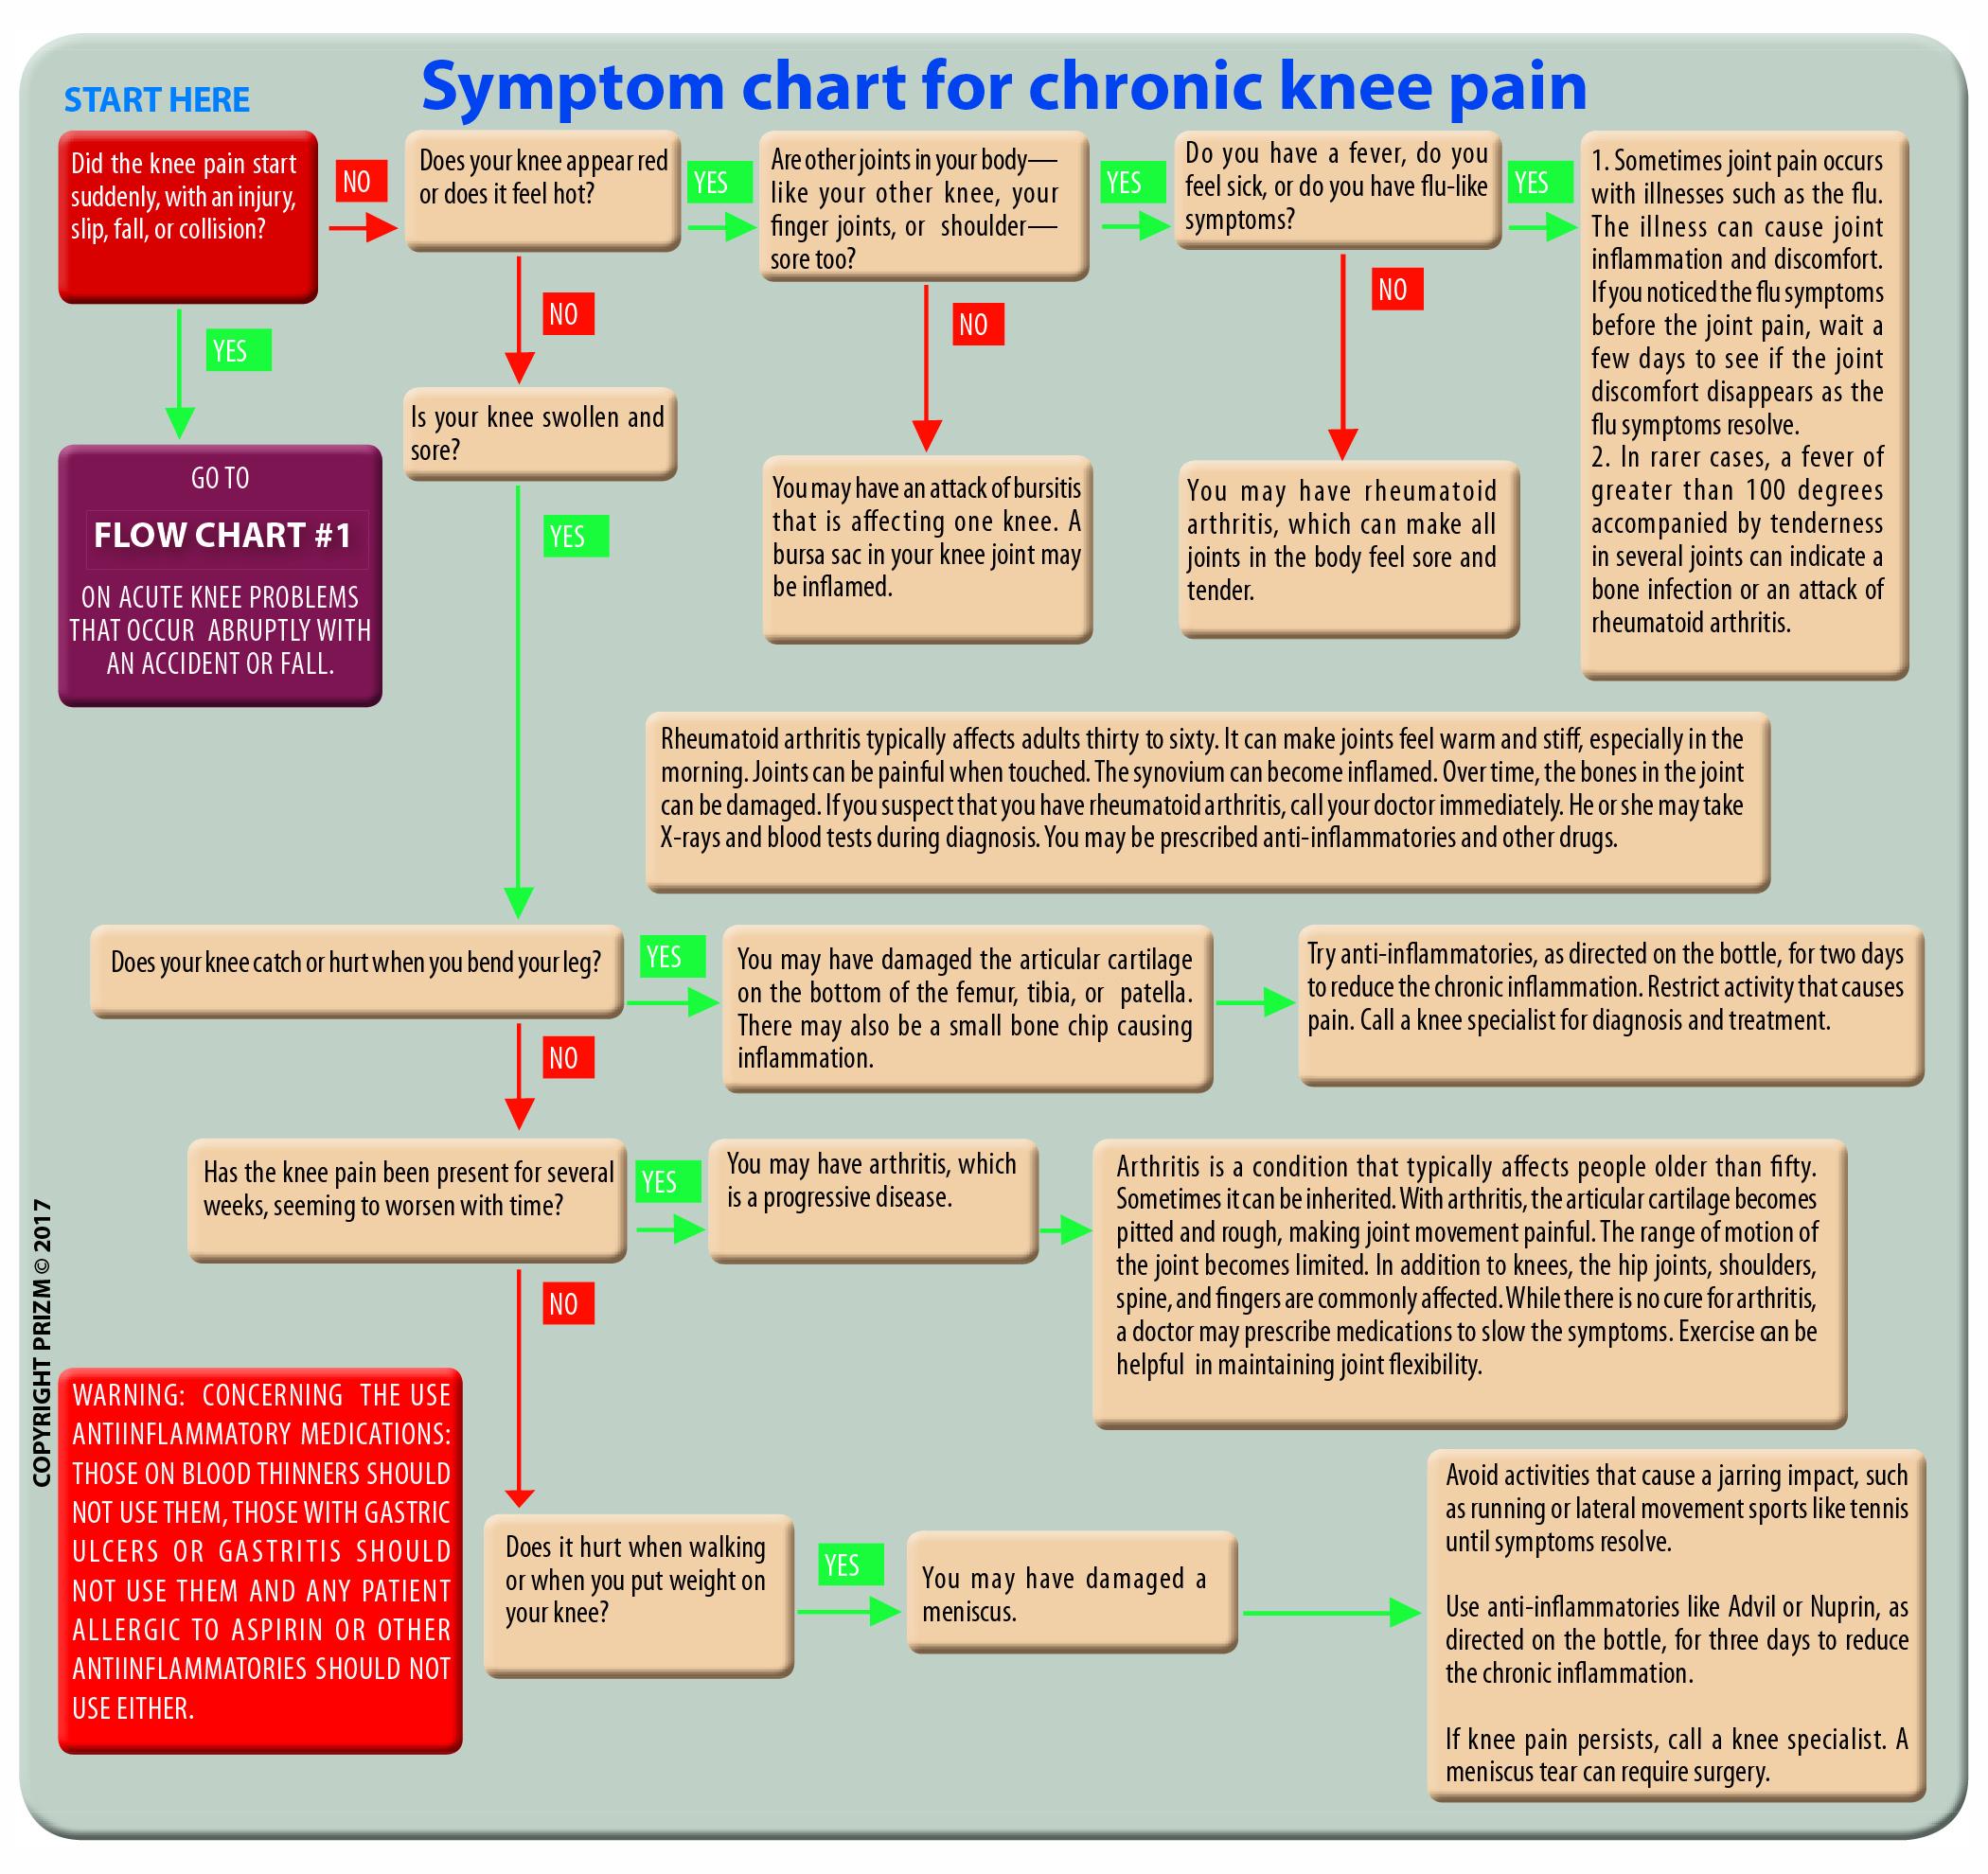 Downloads mini brochure symptoms chart knee pain northwest symptoms chart chronic knee pain pooptronica Image collections